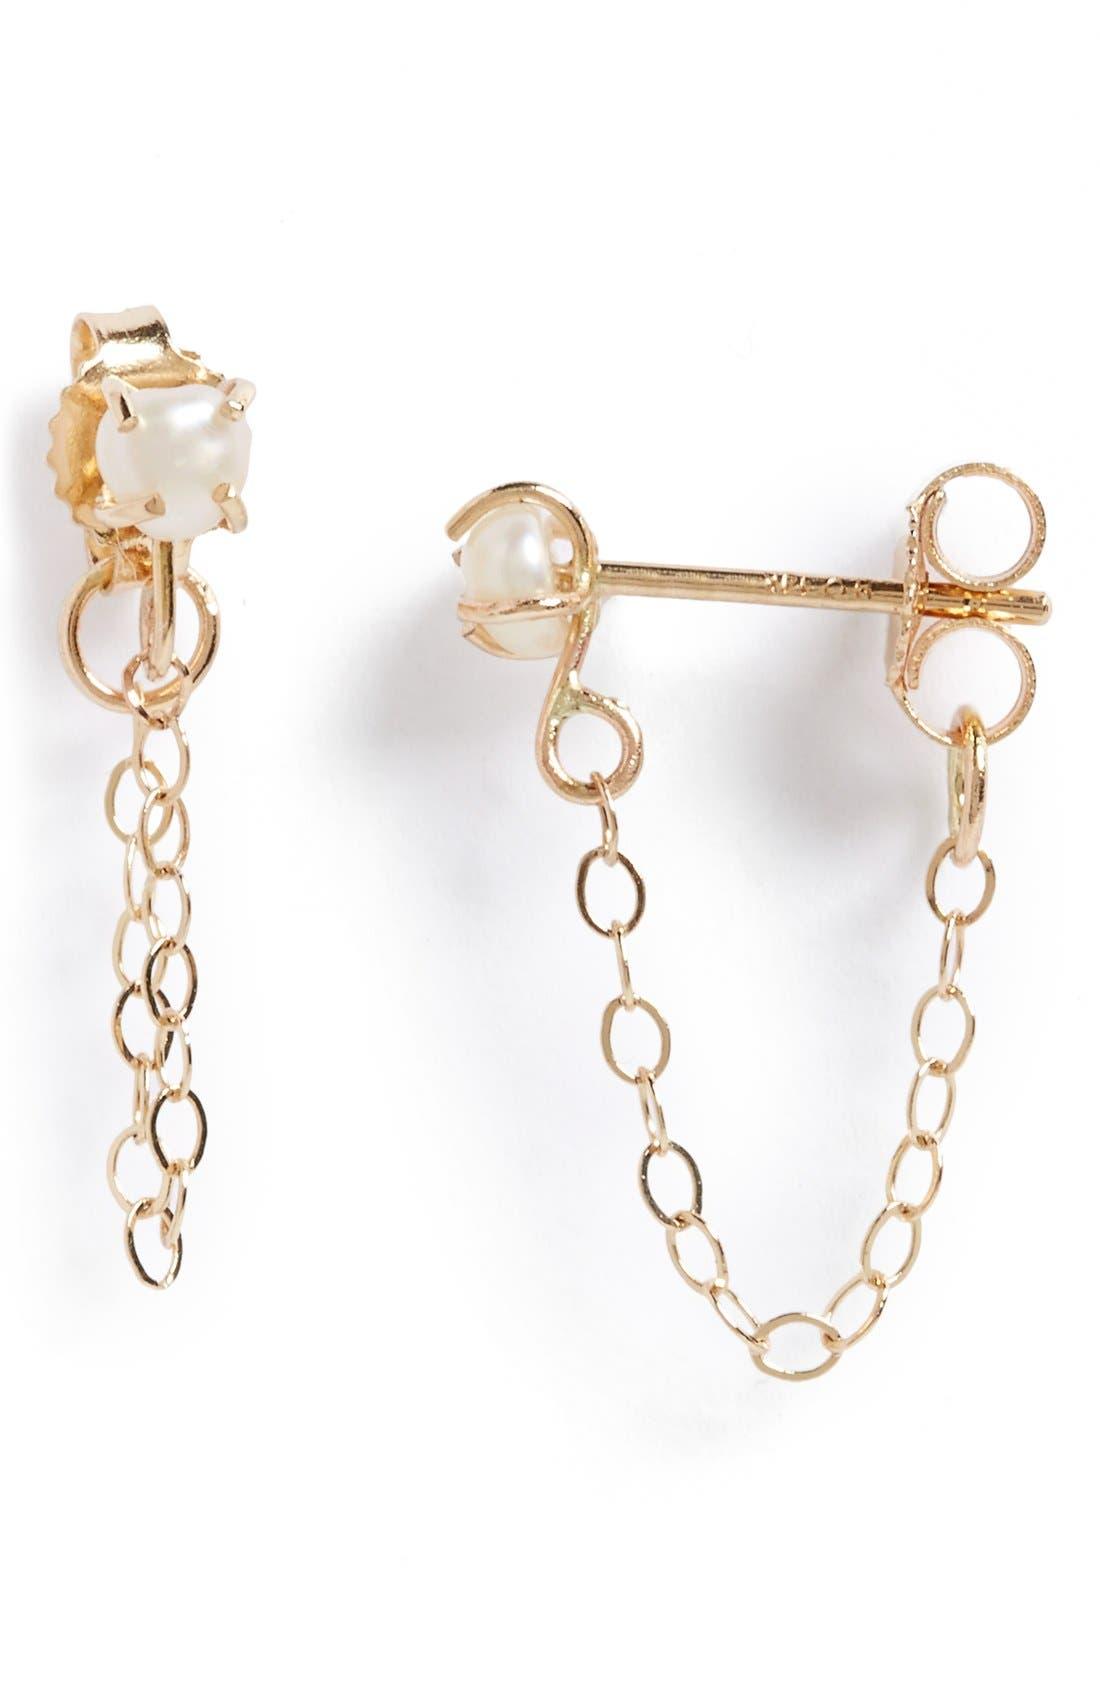 Keshi Pearl Ear Chains,                             Main thumbnail 1, color,                             Keshi Pearl/ Yellow Gold